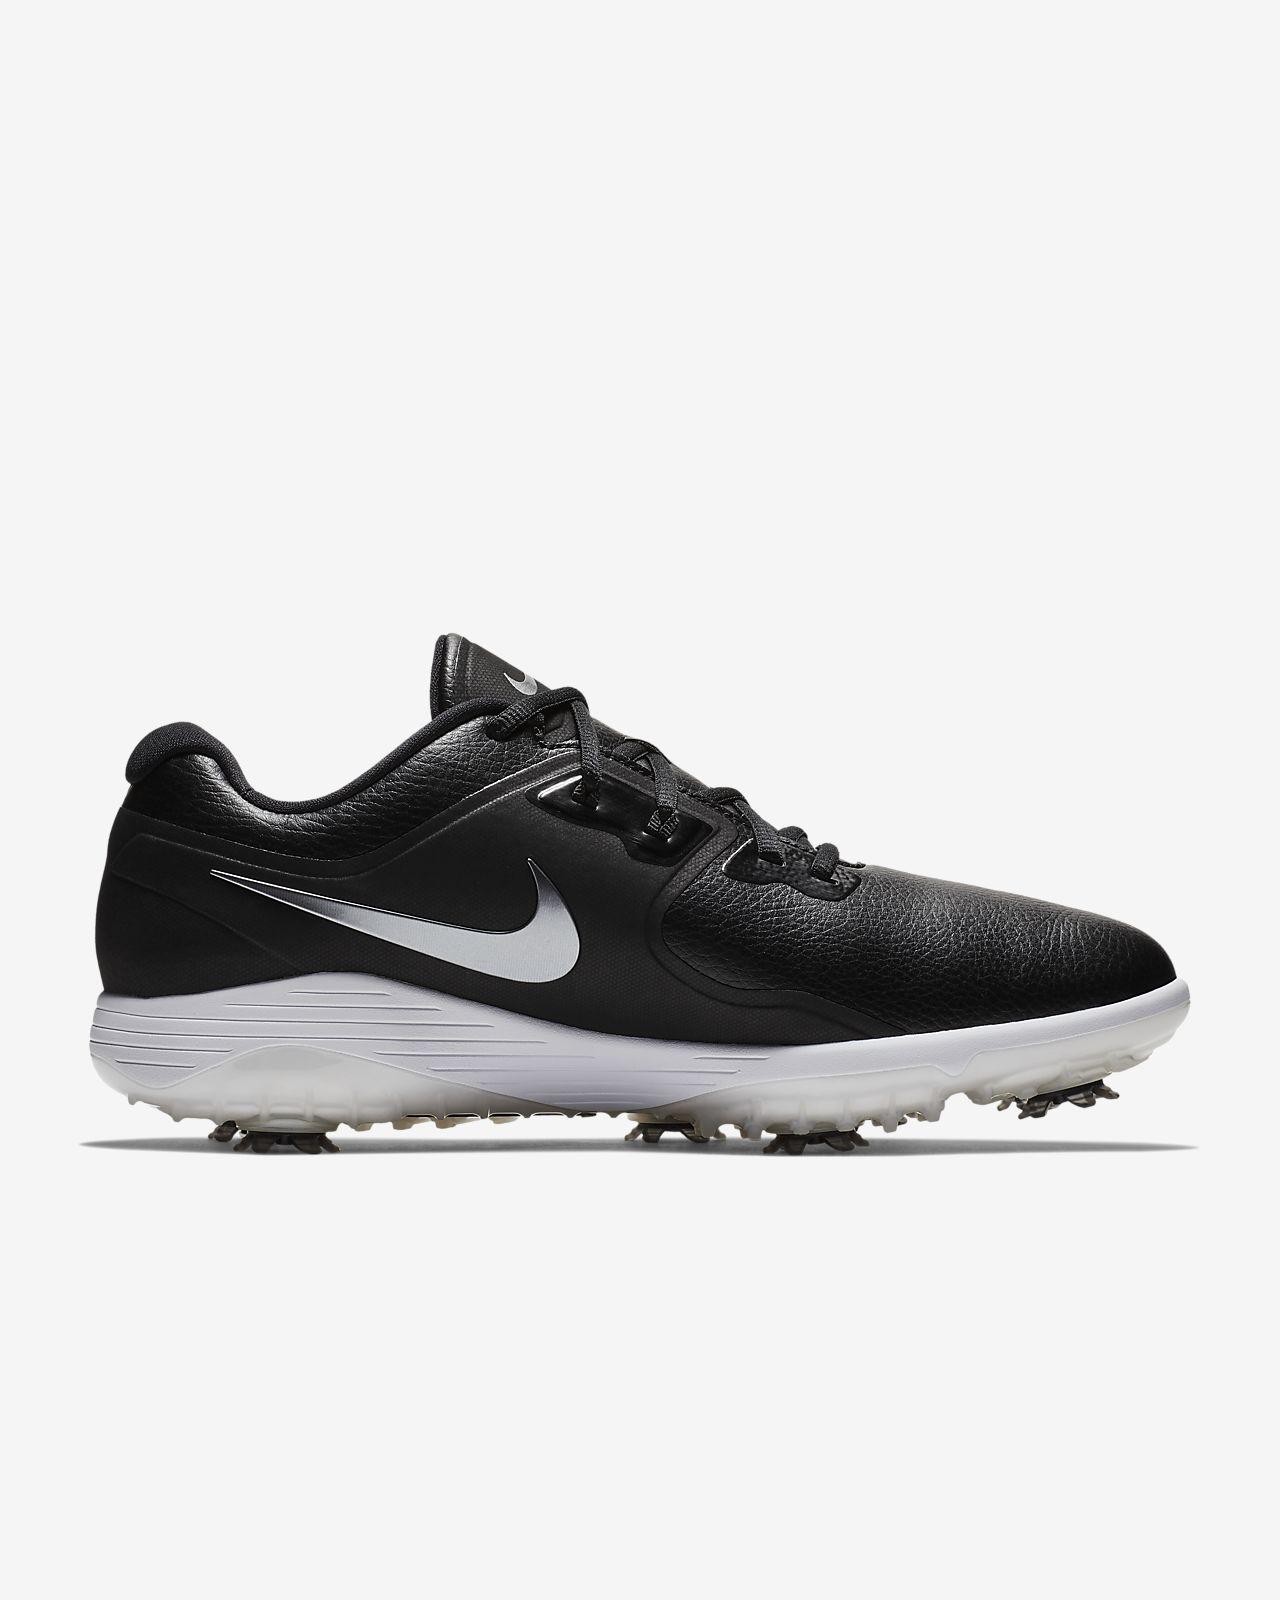 the latest 68e69 5079e ... Męskie buty do golfa Nike Vapor Pro